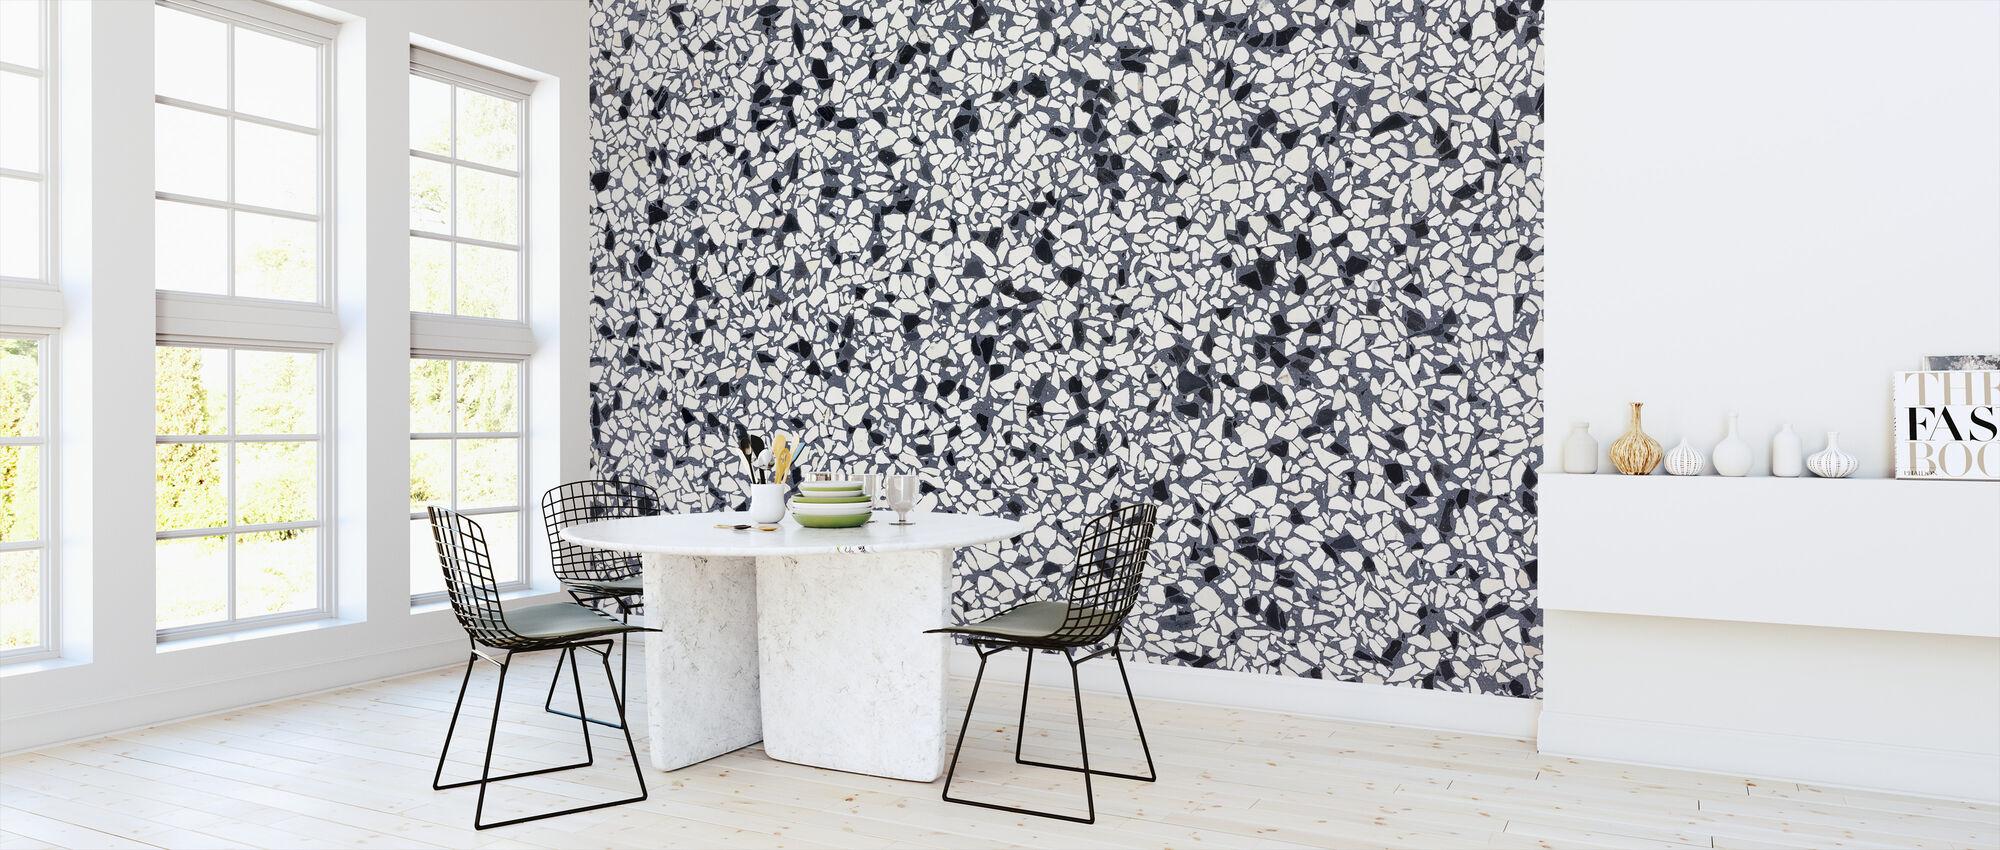 Classic Garden Terrazzo - Wallpaper - Kitchen